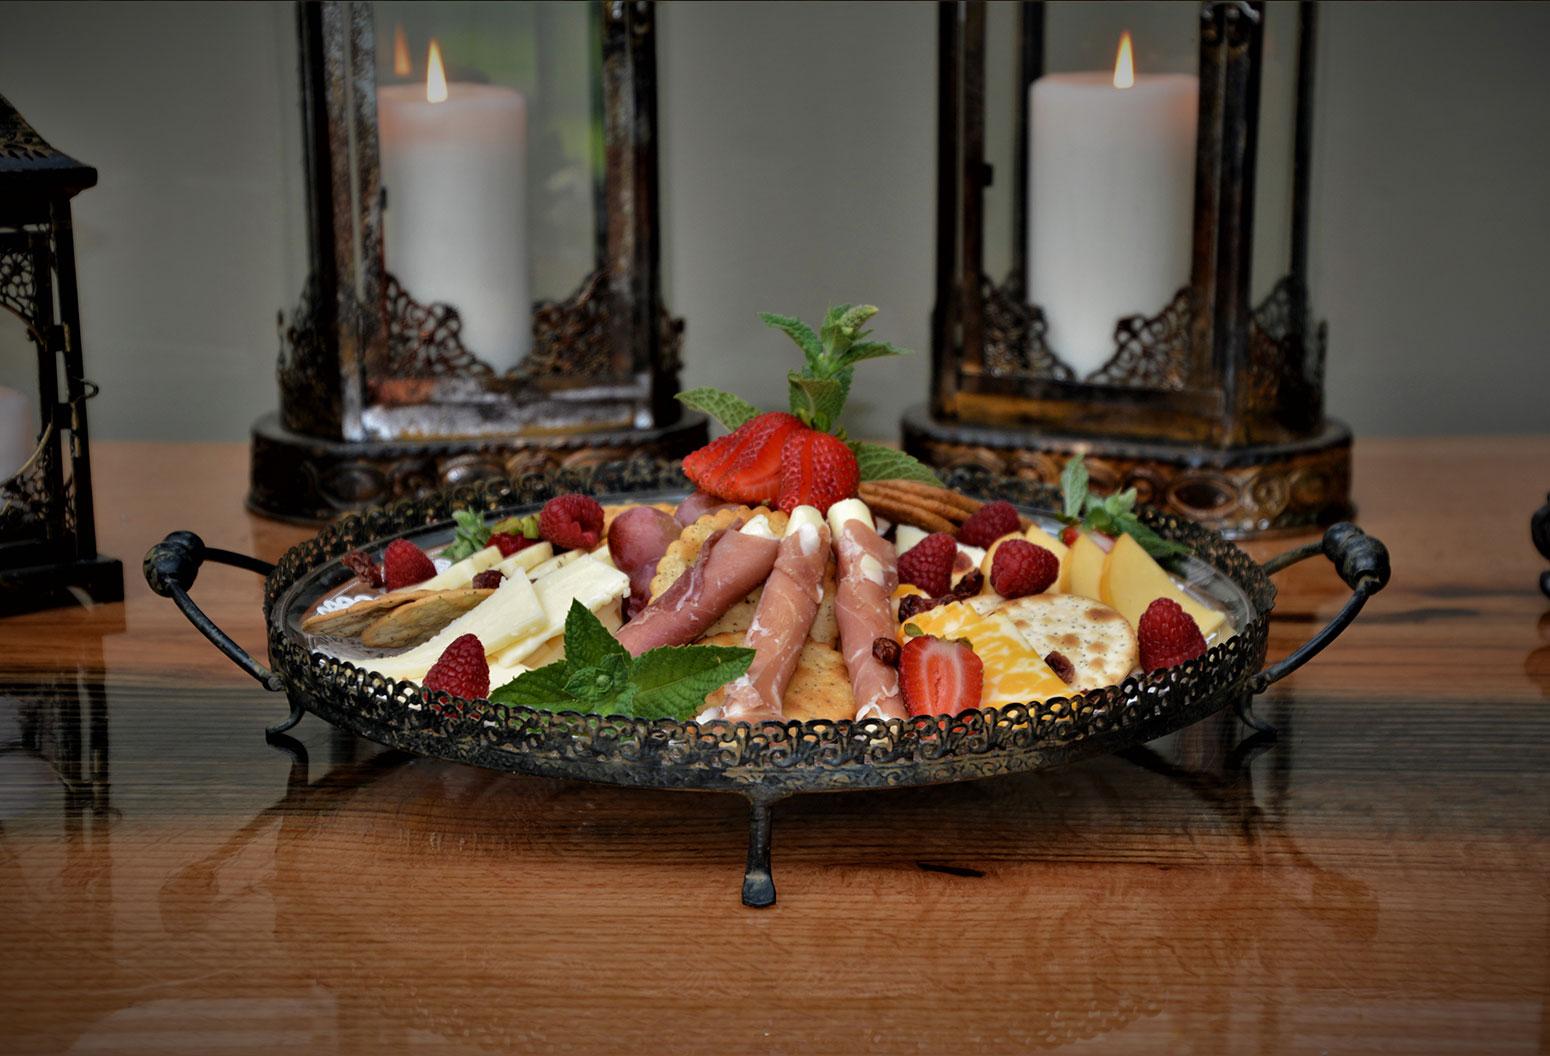 Finger Lakes Creamery Platter, Magnolia Place Bed & Breakfast, Finger Lakes, NY